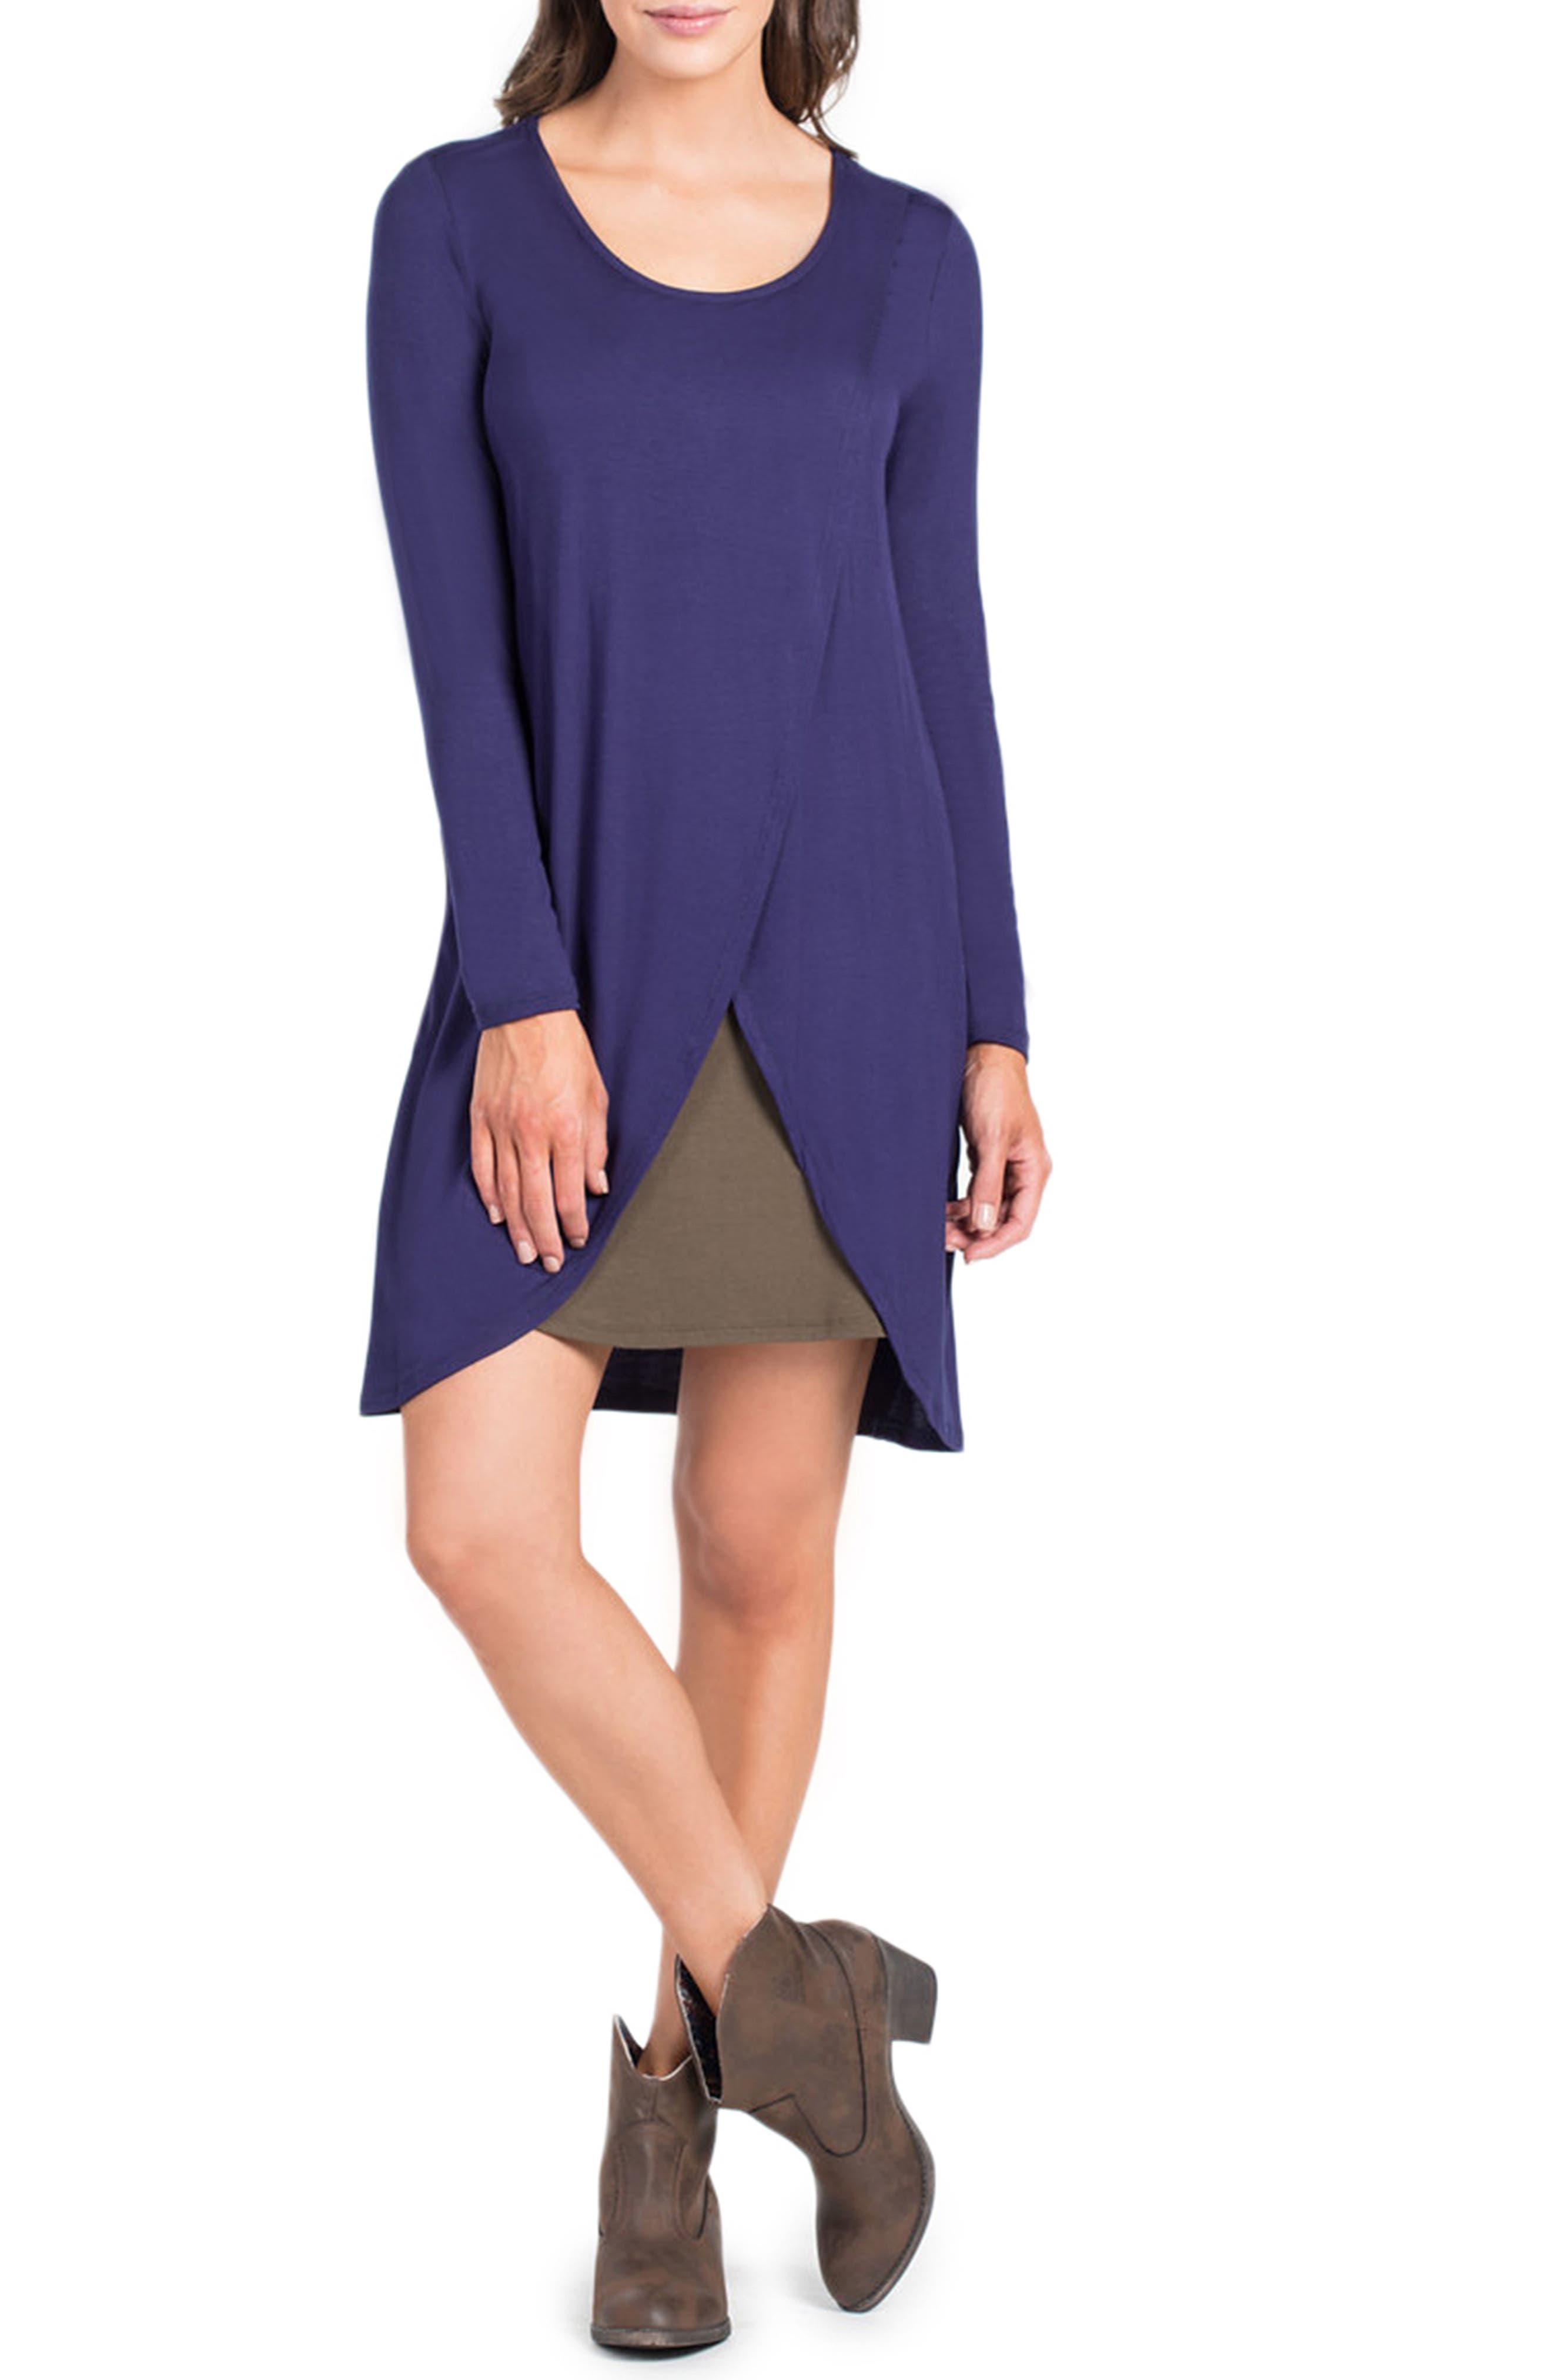 Lenox Crossover Front Maternity/Nursing Dress,                             Main thumbnail 1, color,                             Navy/ Olive